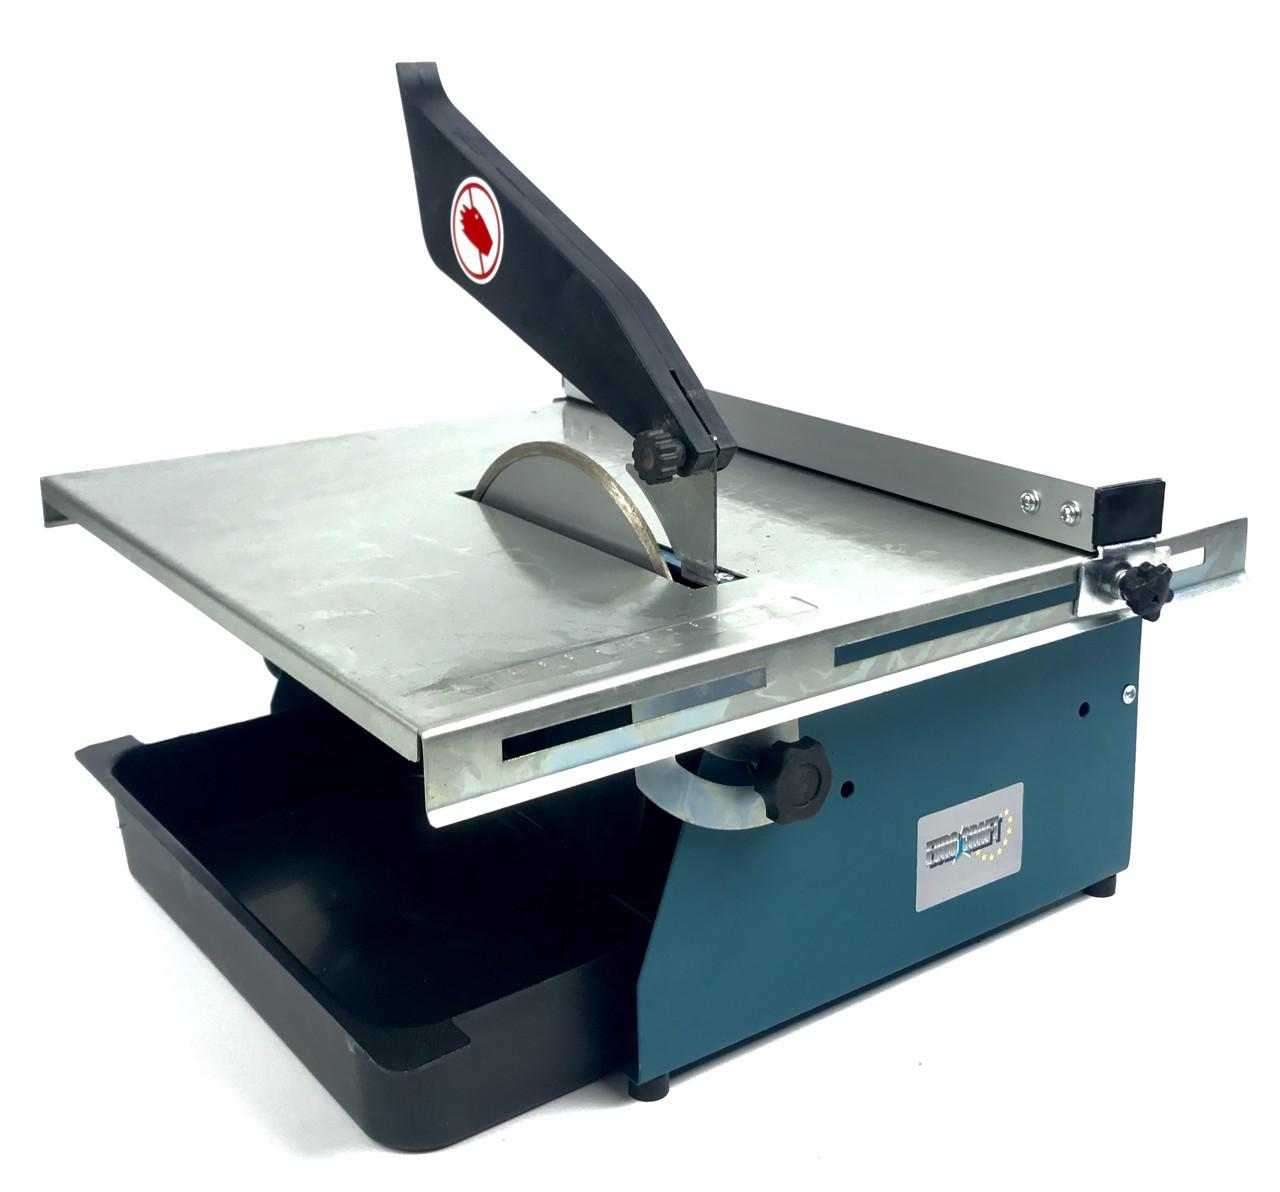 Електричний плиткоріз Euro Craft 1500W (LXSM16)